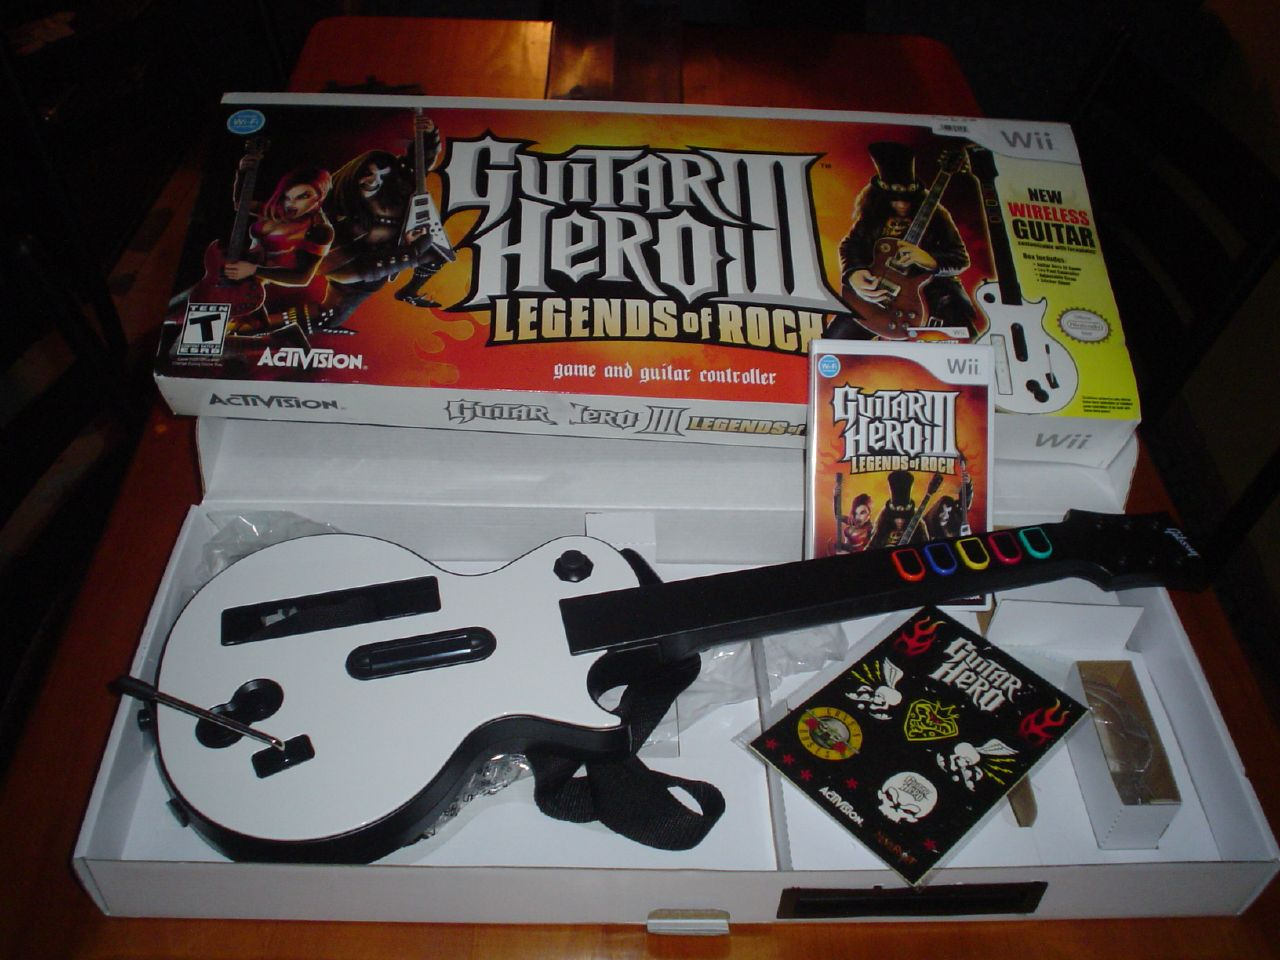 wii guitar hero iii legends of rock a photo on flickriver. Black Bedroom Furniture Sets. Home Design Ideas